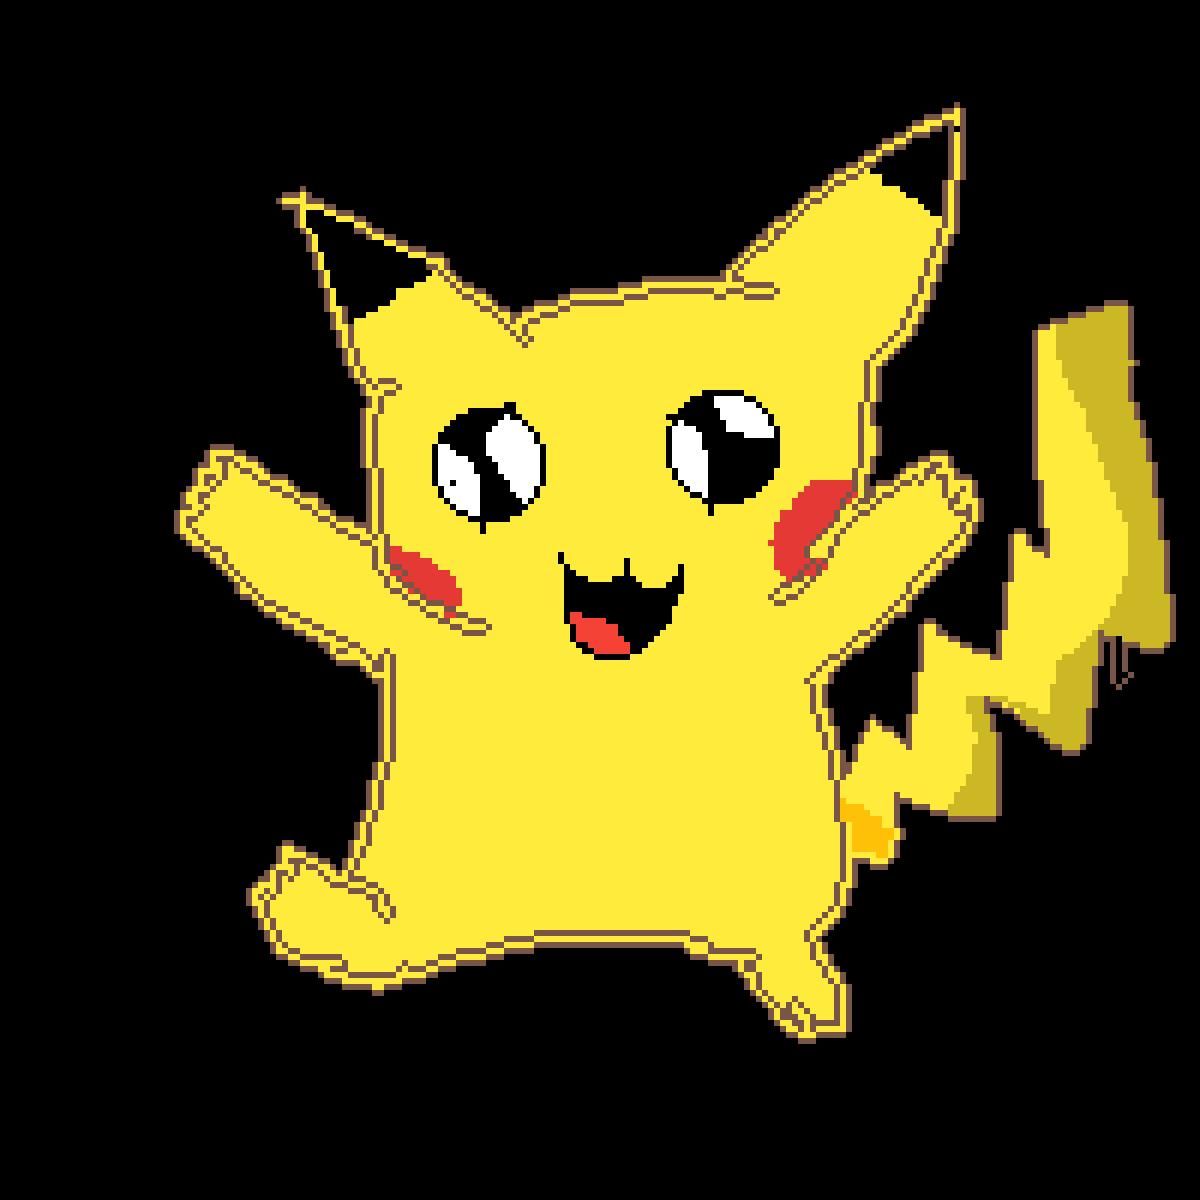 Pikachuuuuuuuuuuu by WOLVES4LIFECC